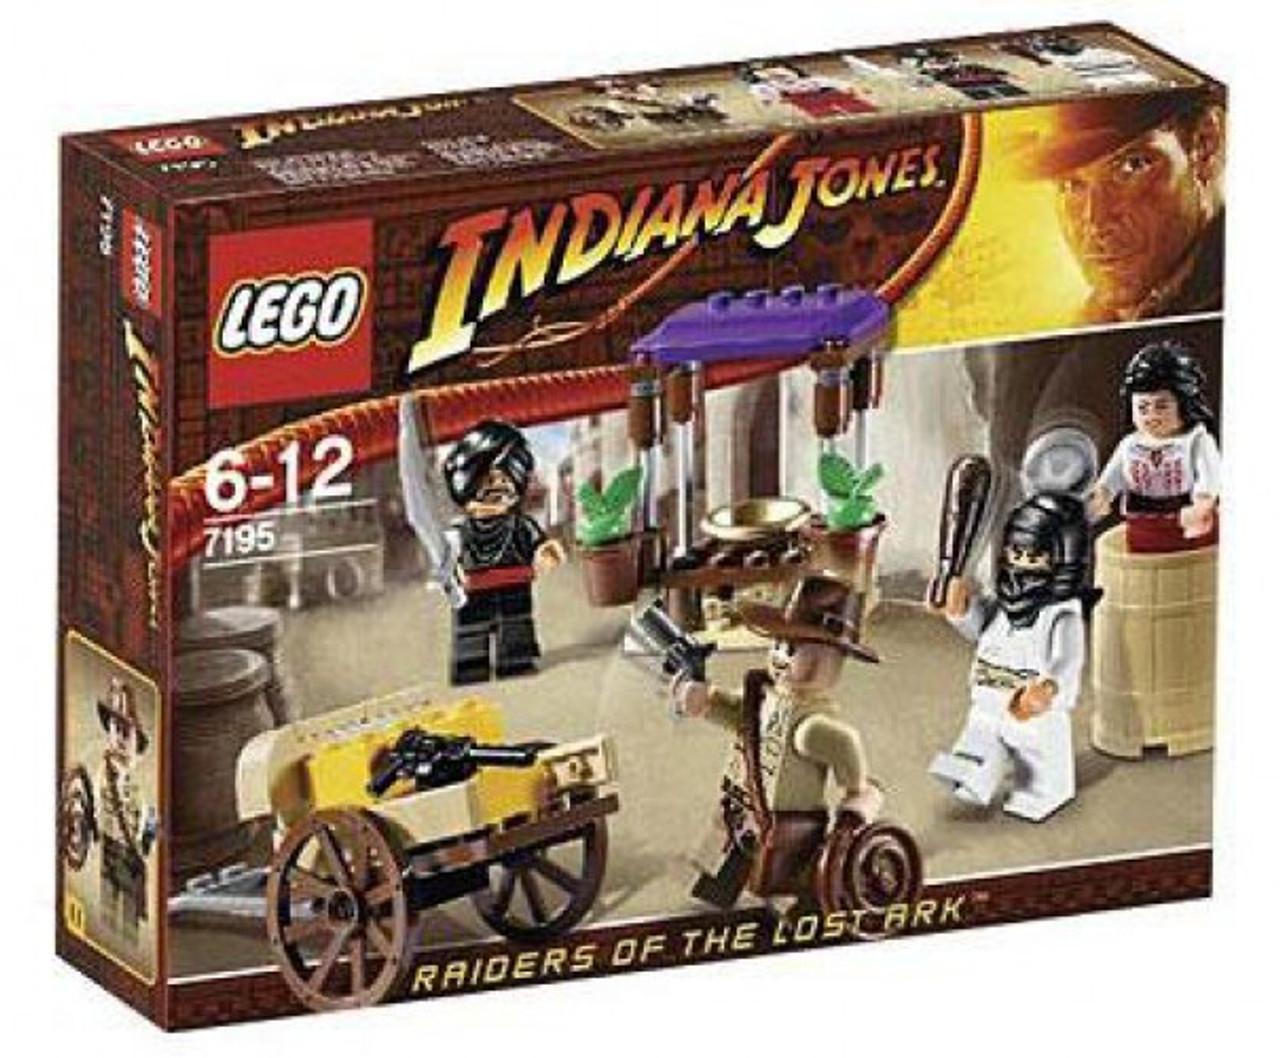 LEGO Indiana Jones Ambush in Cairo Set #7195